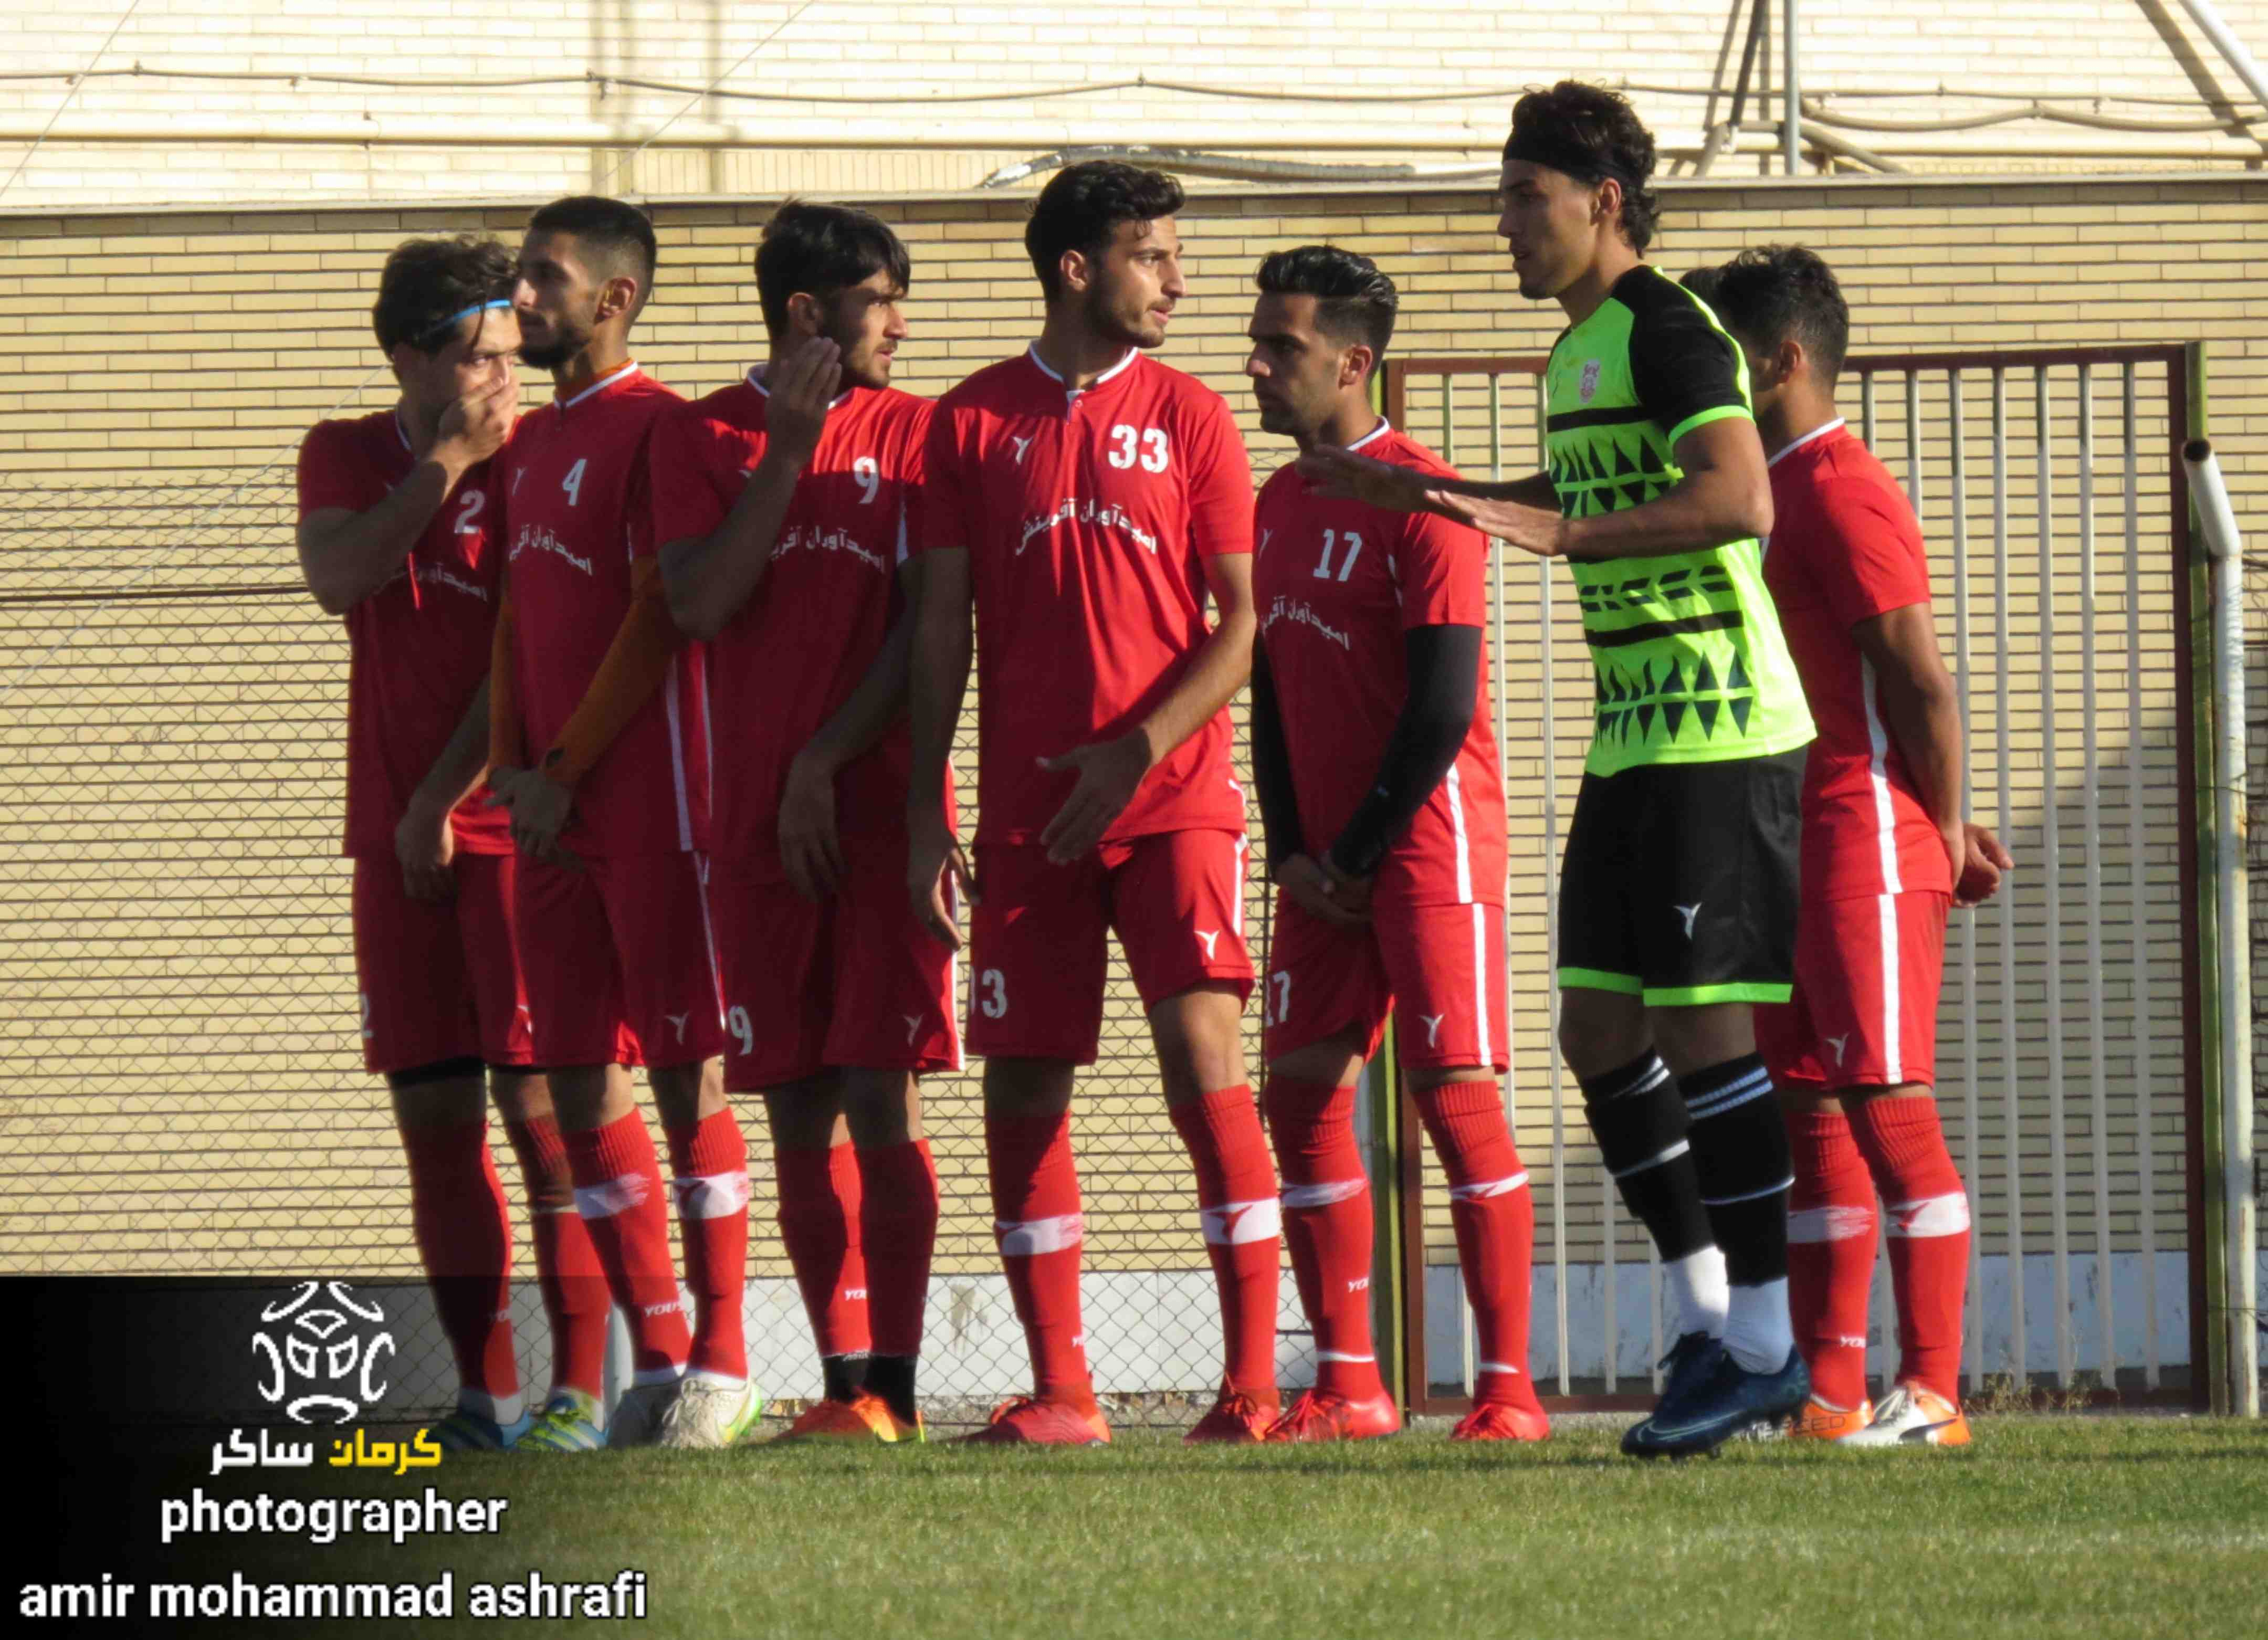 برنامه کامل گروه پنجم مرحله نخست لیگ دسته سوم فوتبال کشور